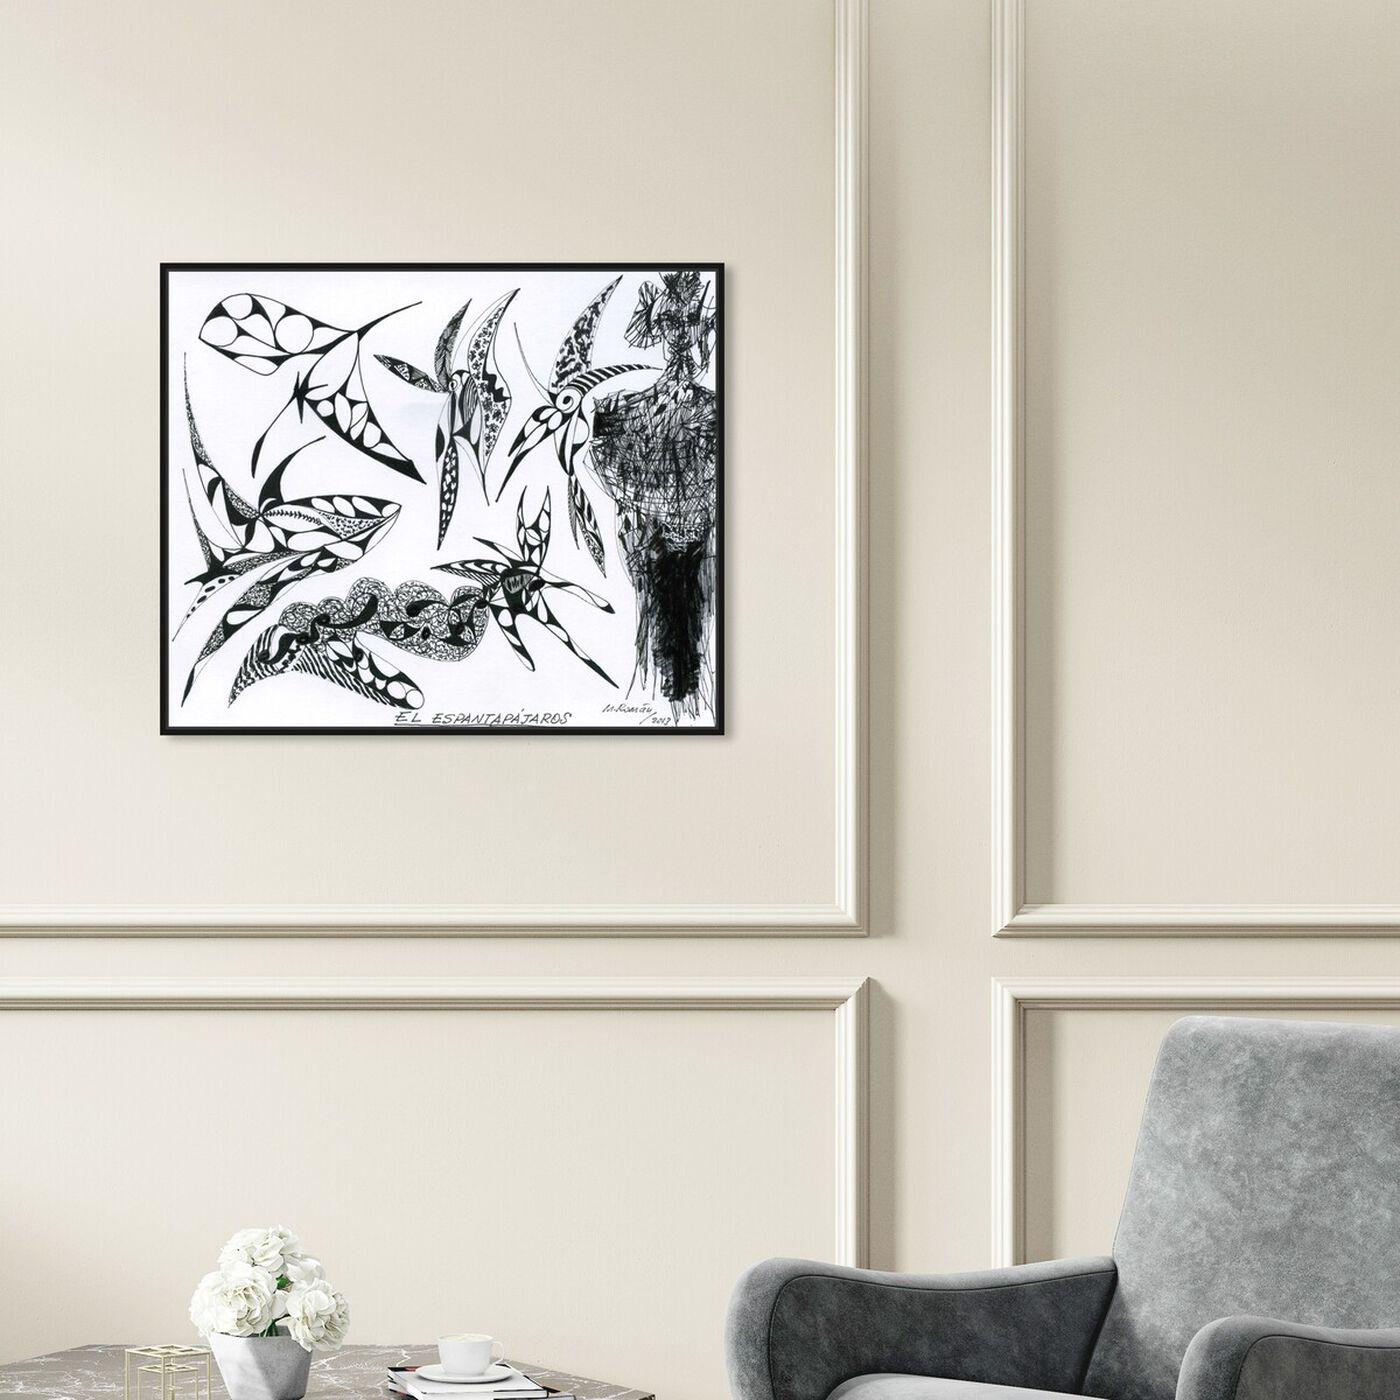 Hanging view of El Espantapajaros featuring abstract and geometric art.